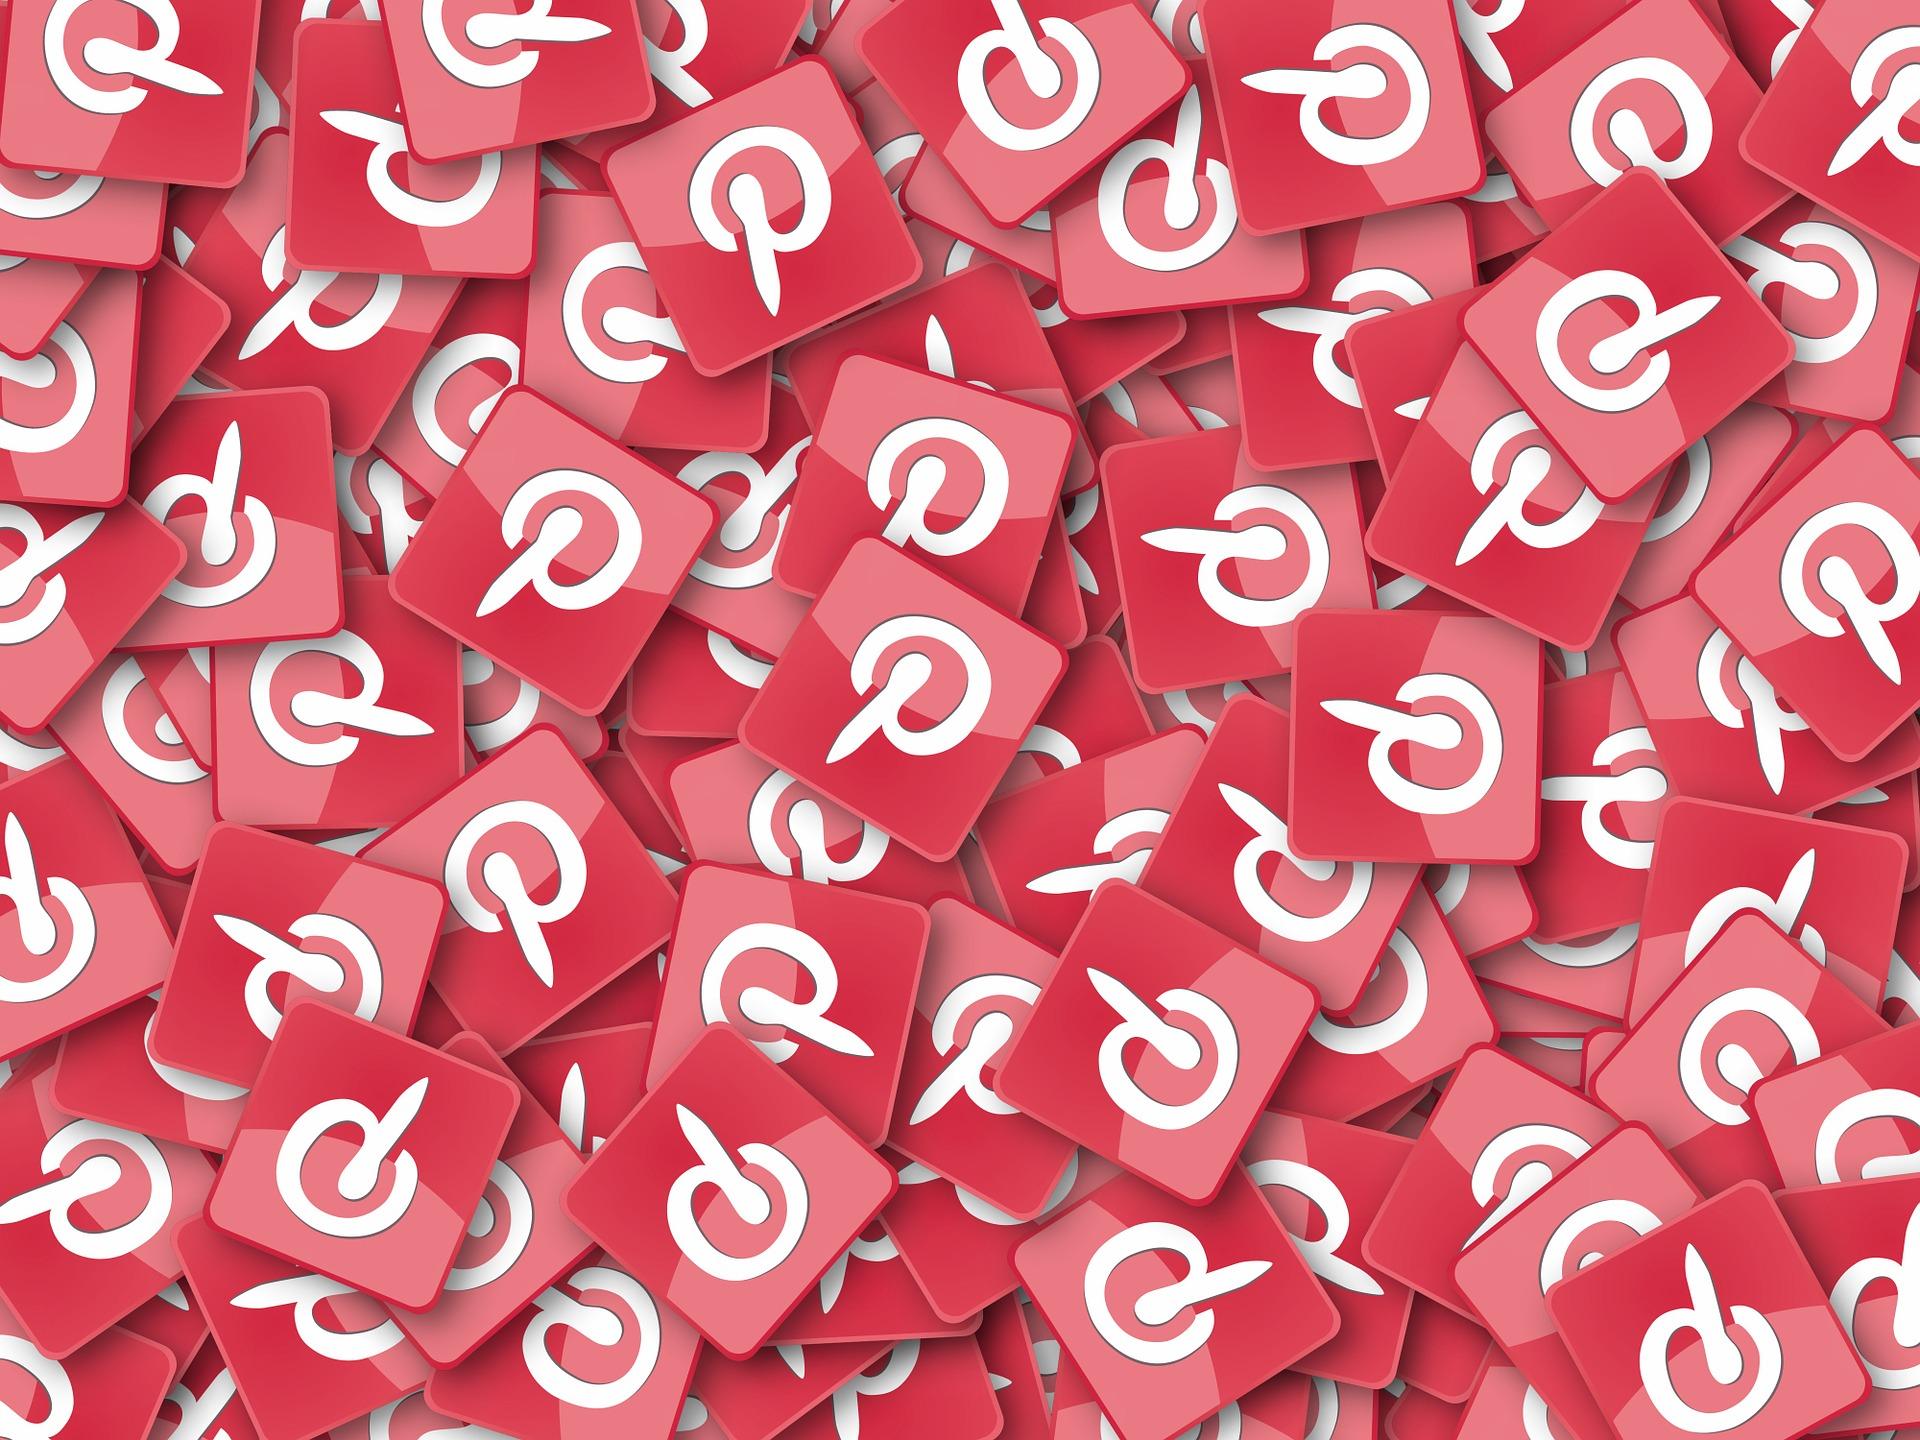 Pinterest stickers